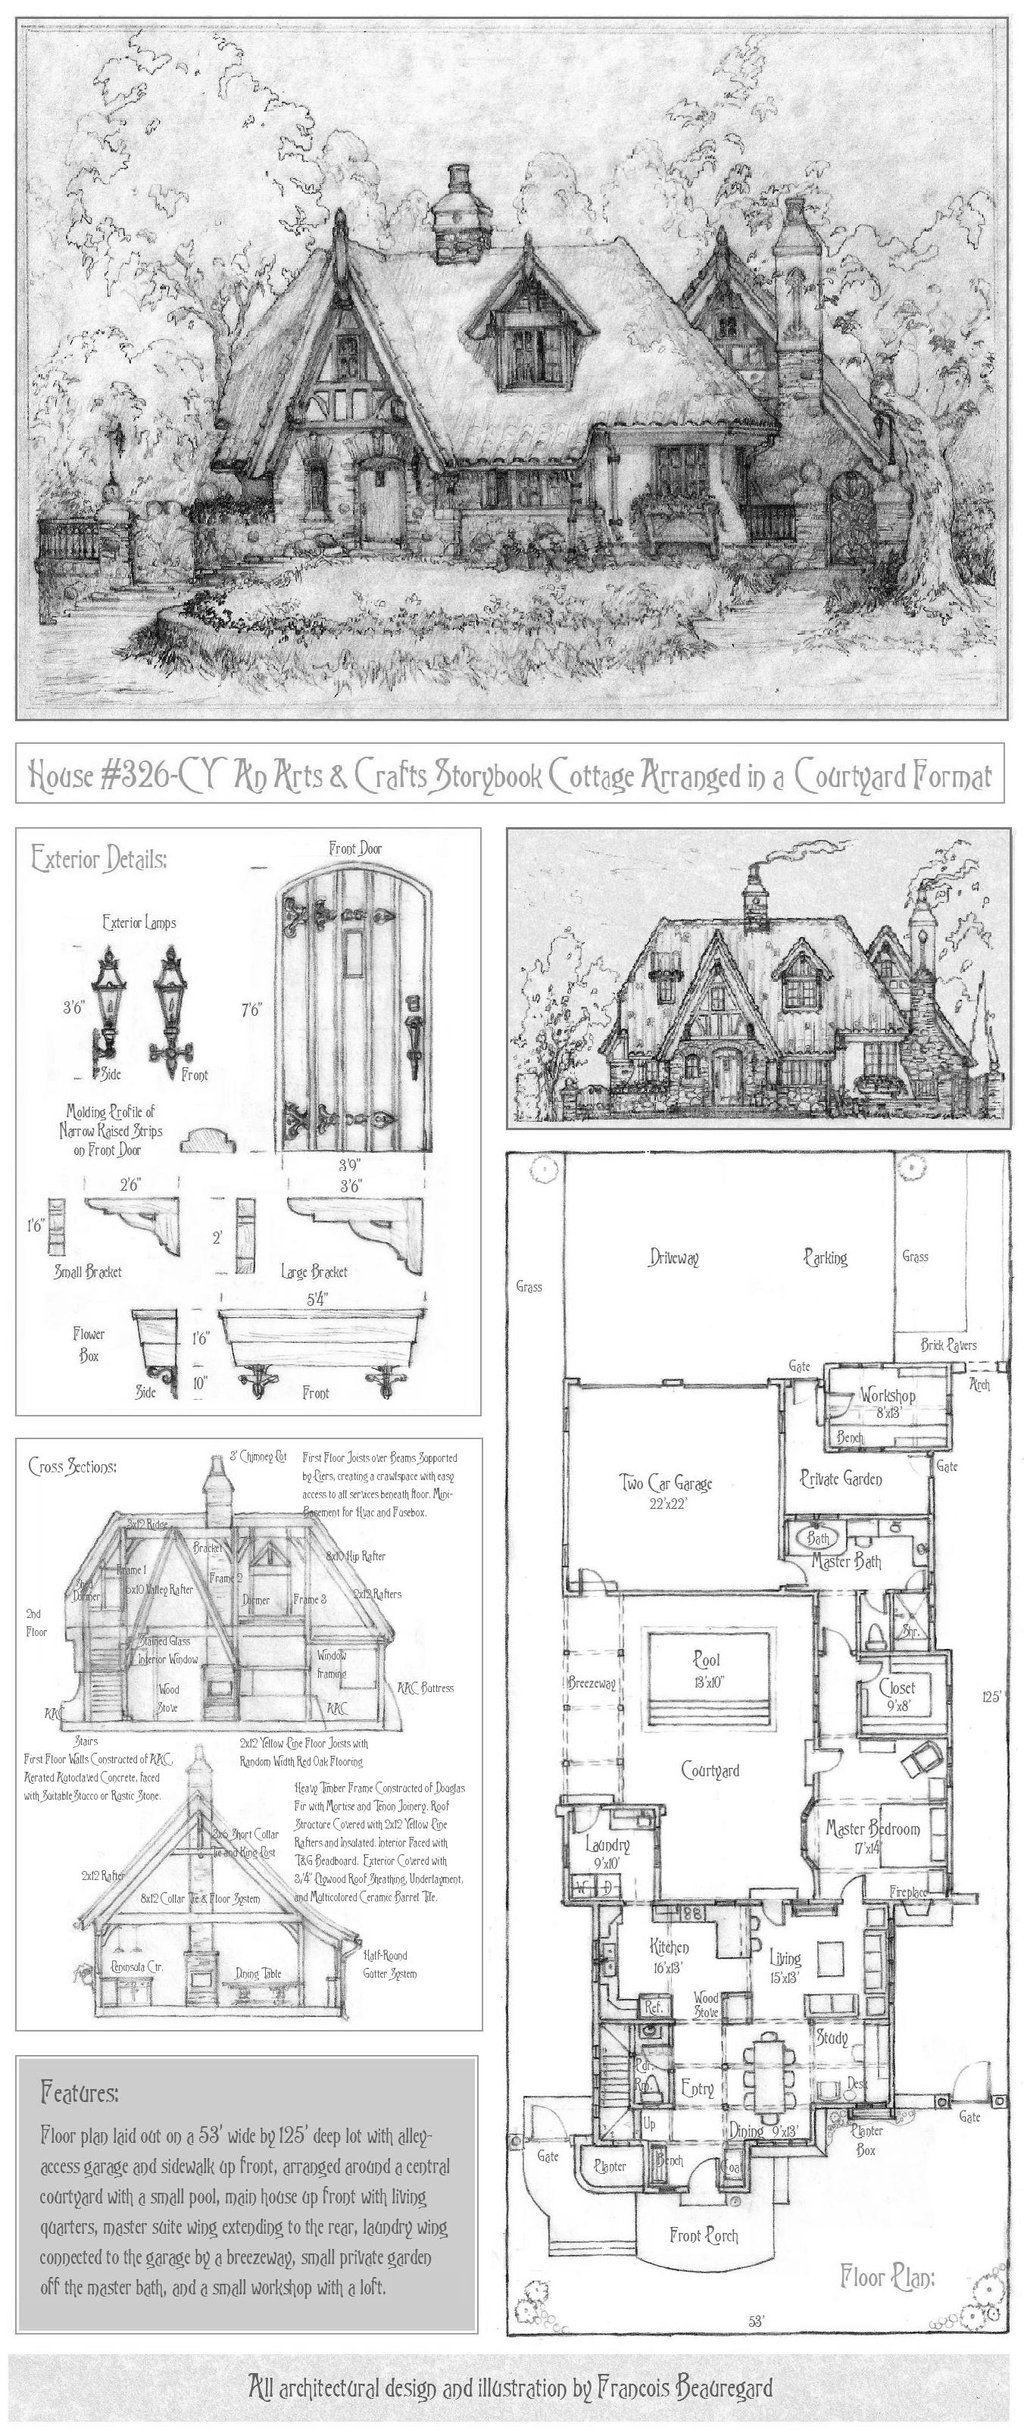 House 326 Full Plan With Portrait By Built4ever On Deviantart Cottage Plan Storybook Cottage Vintage House Plans